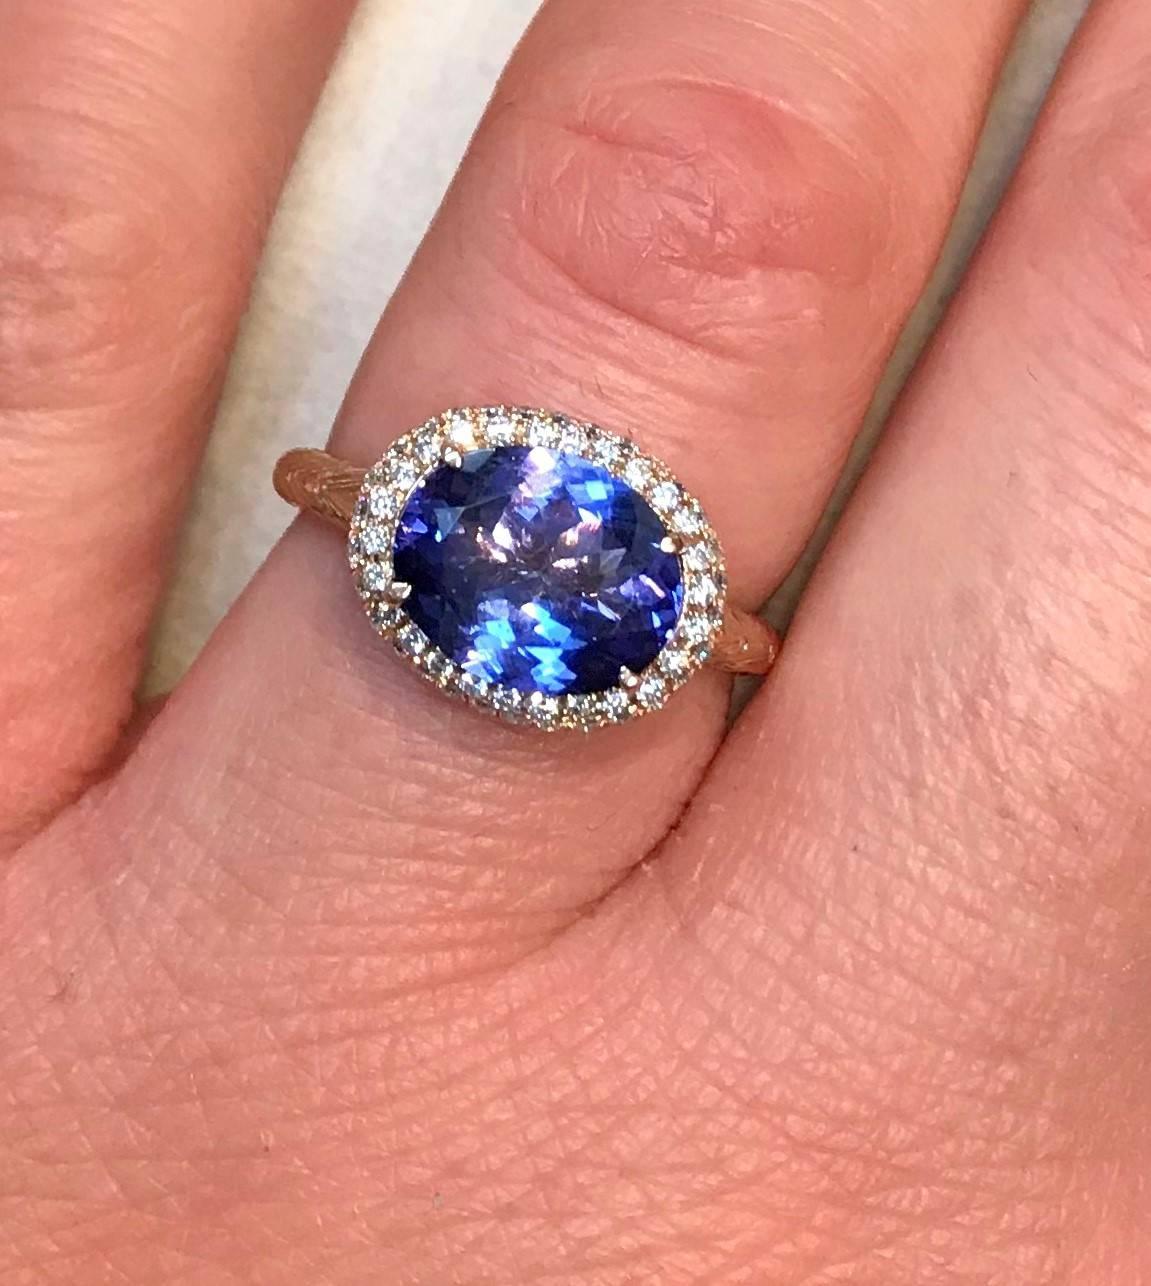 2.08 Carat Tanzanite Halo Ring For Sale at 1stdibs